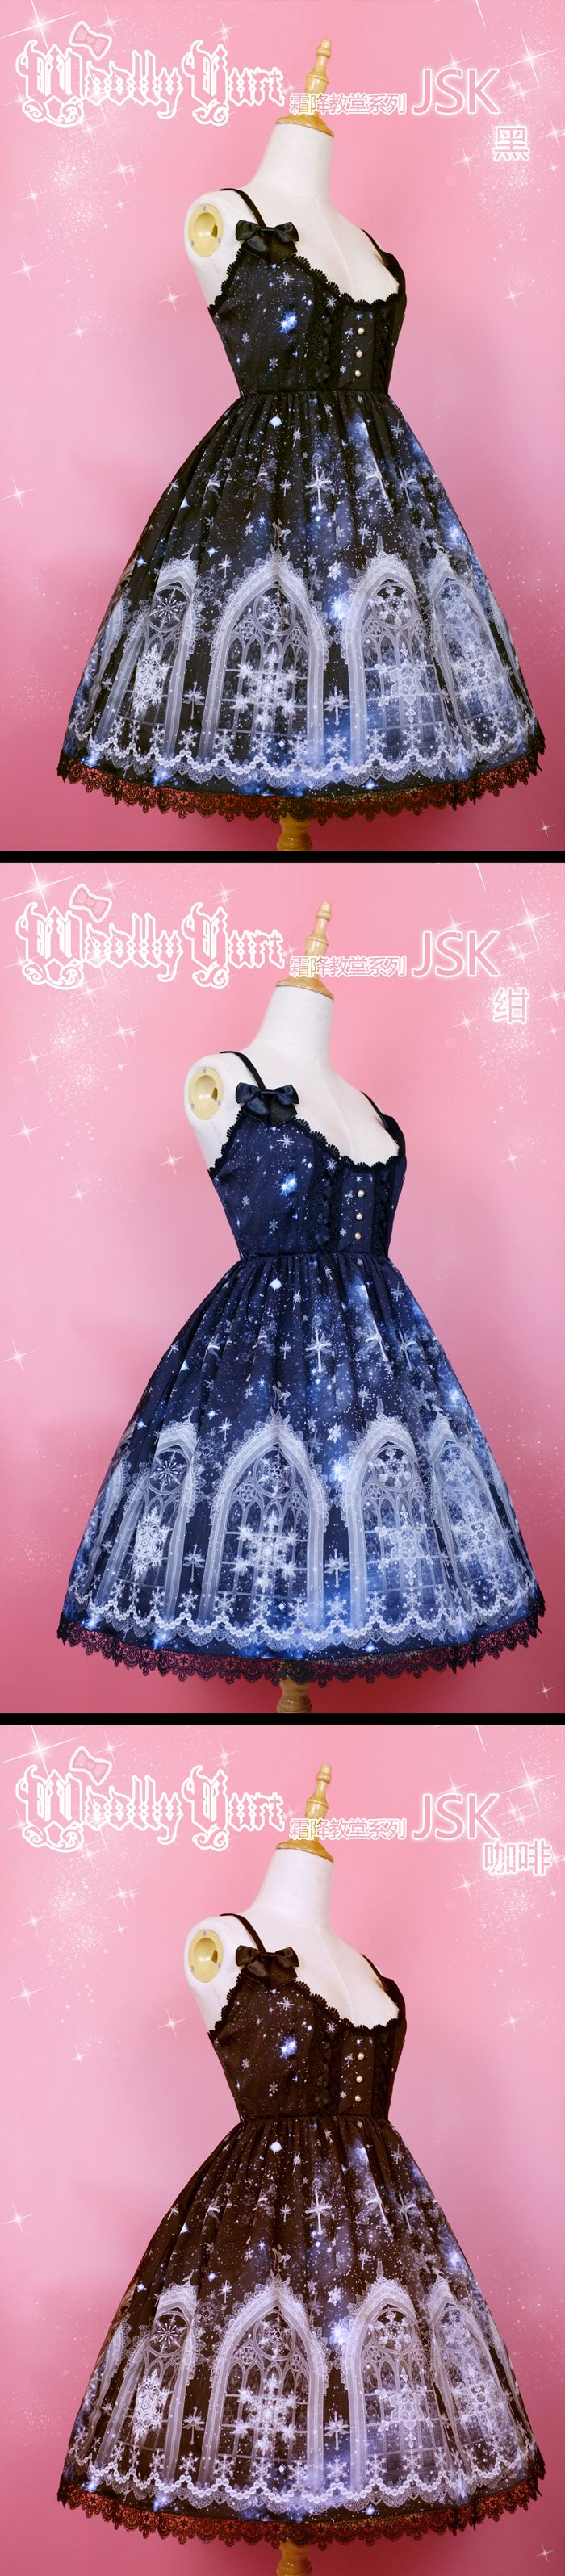 JSK】【定金】woollyyurt原创lolita-霜降教堂-淘宝网   Lolita ...